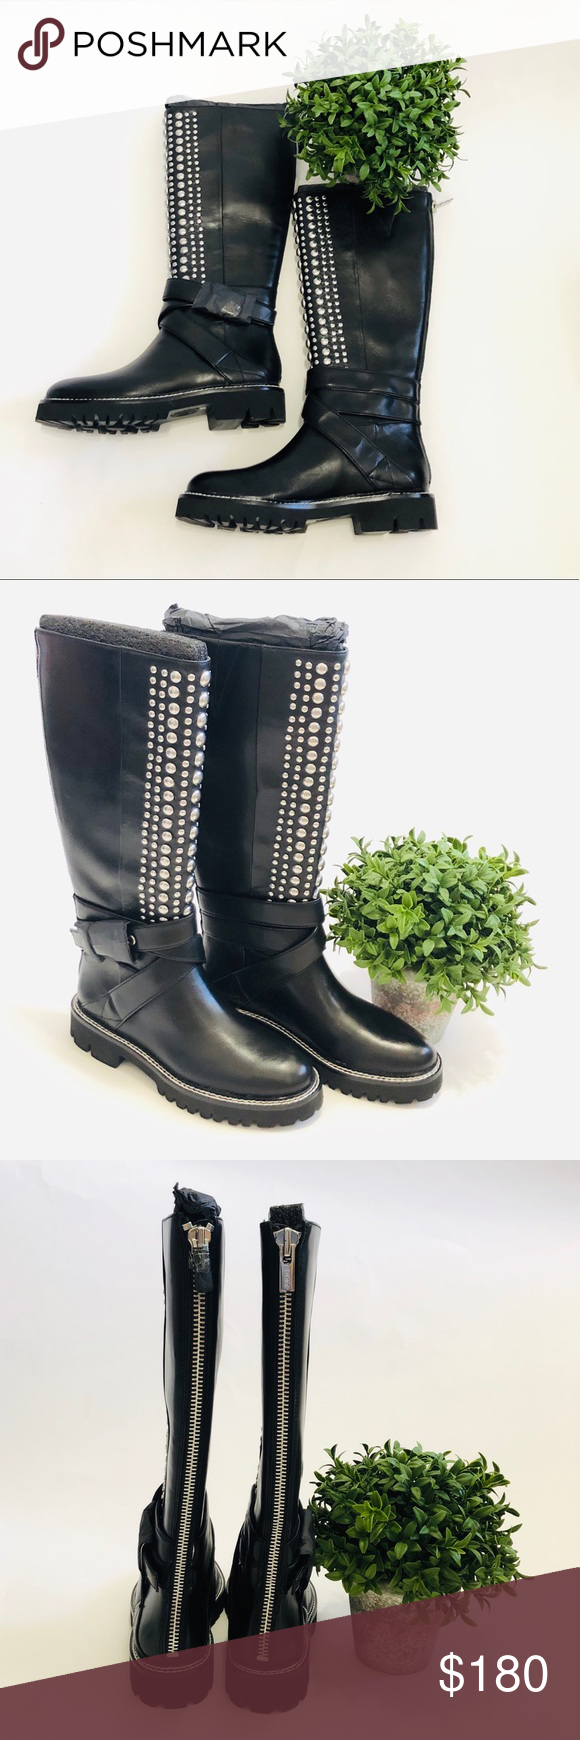 DKNY Babz Knee High Boots - Black Size